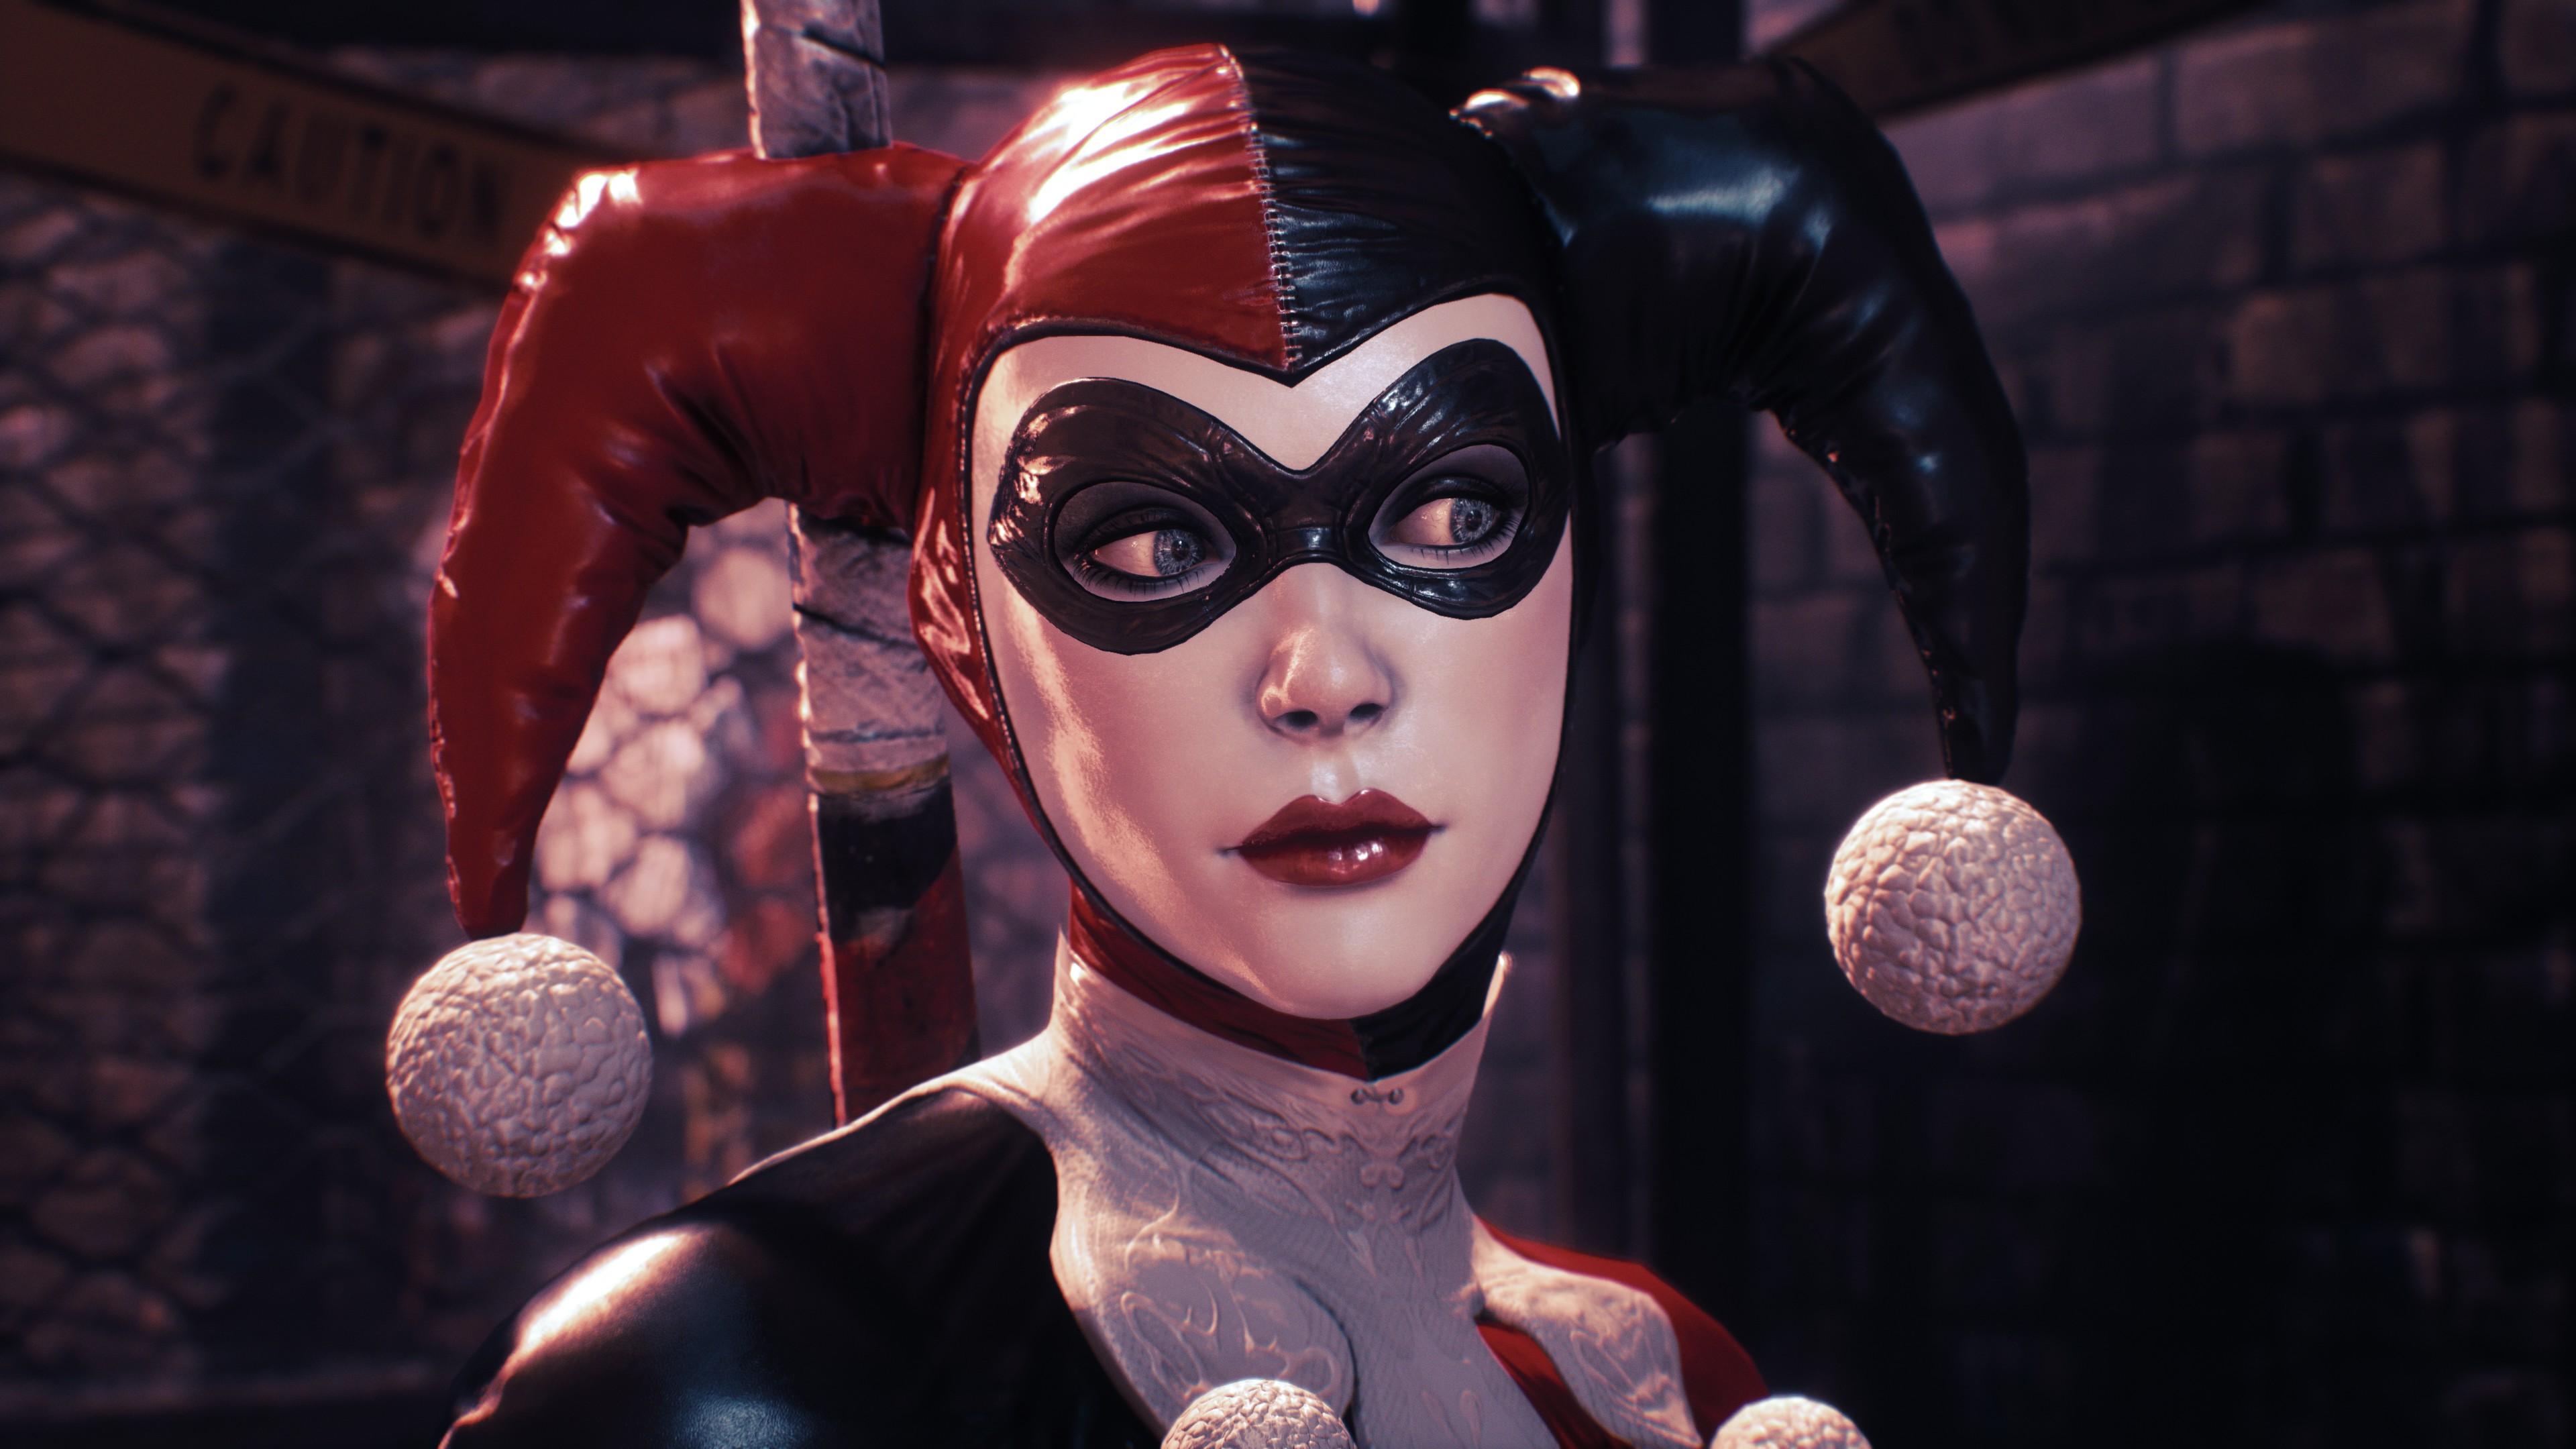 Skyrim Fall Wallpaper Hd Free Download Harley Quinn Backgrounds Pixelstalk Net